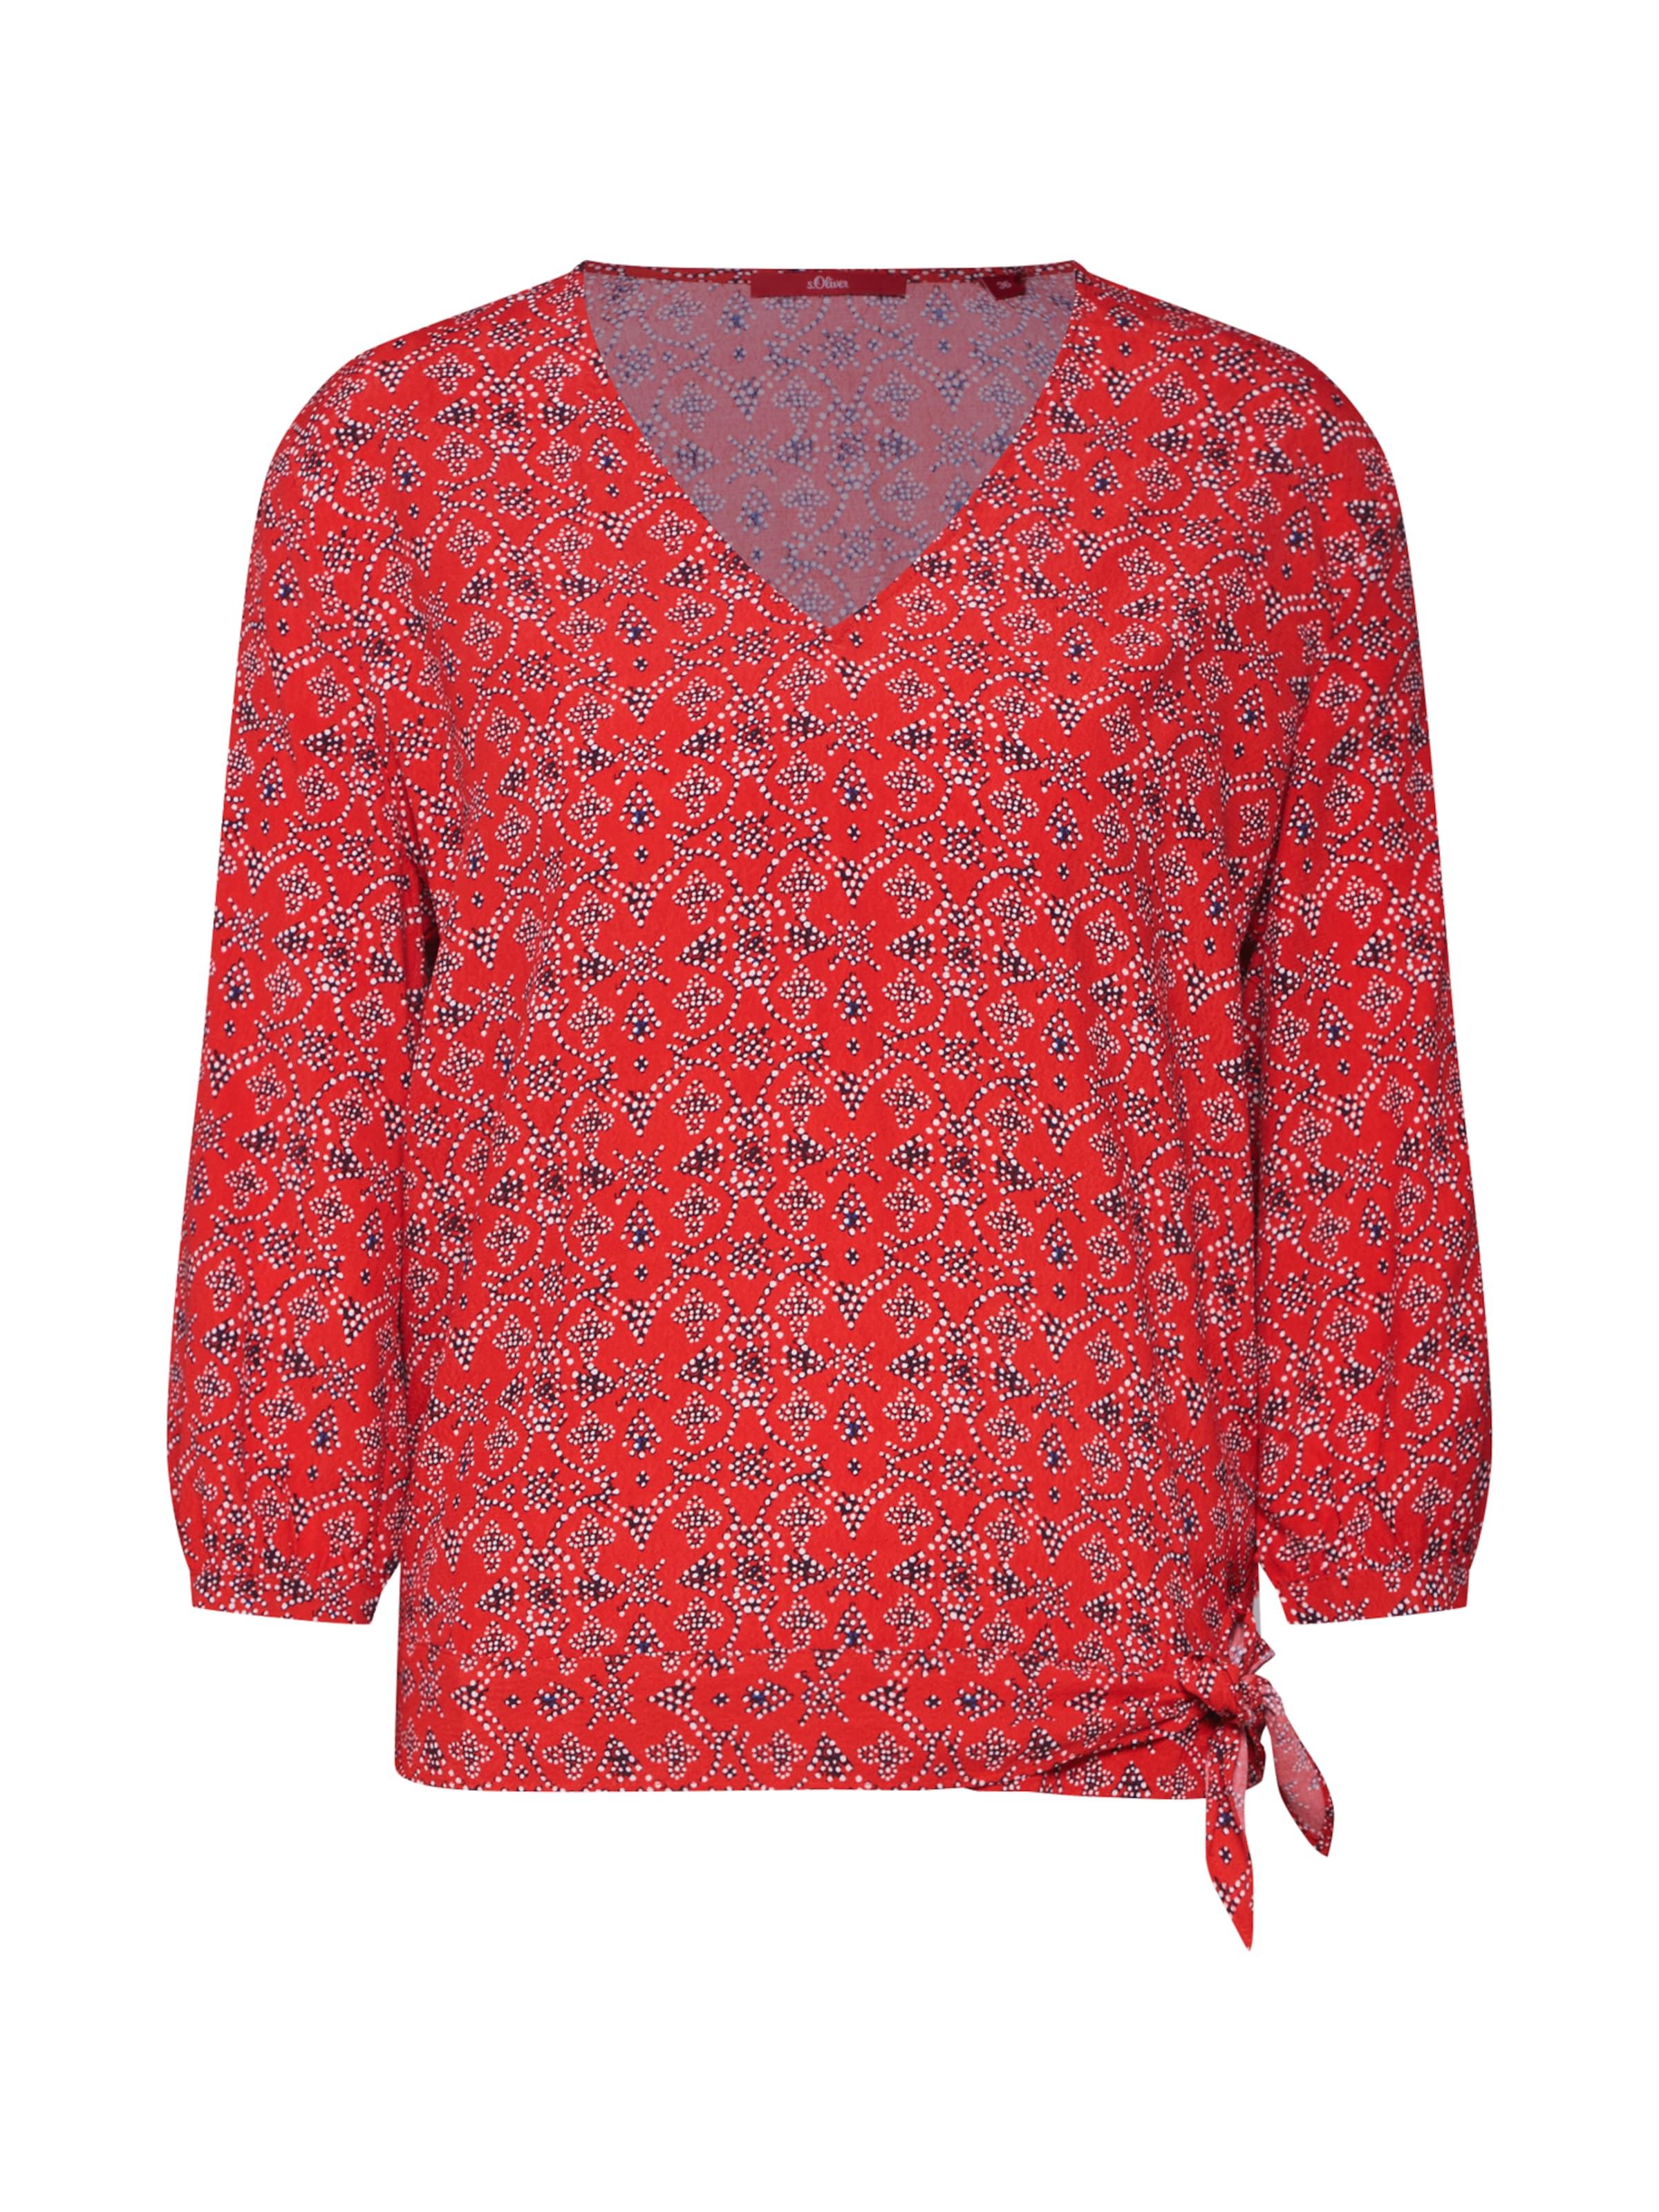 Blusenshirt Red S In oliver Label MischfarbenRot rdeCxBoW